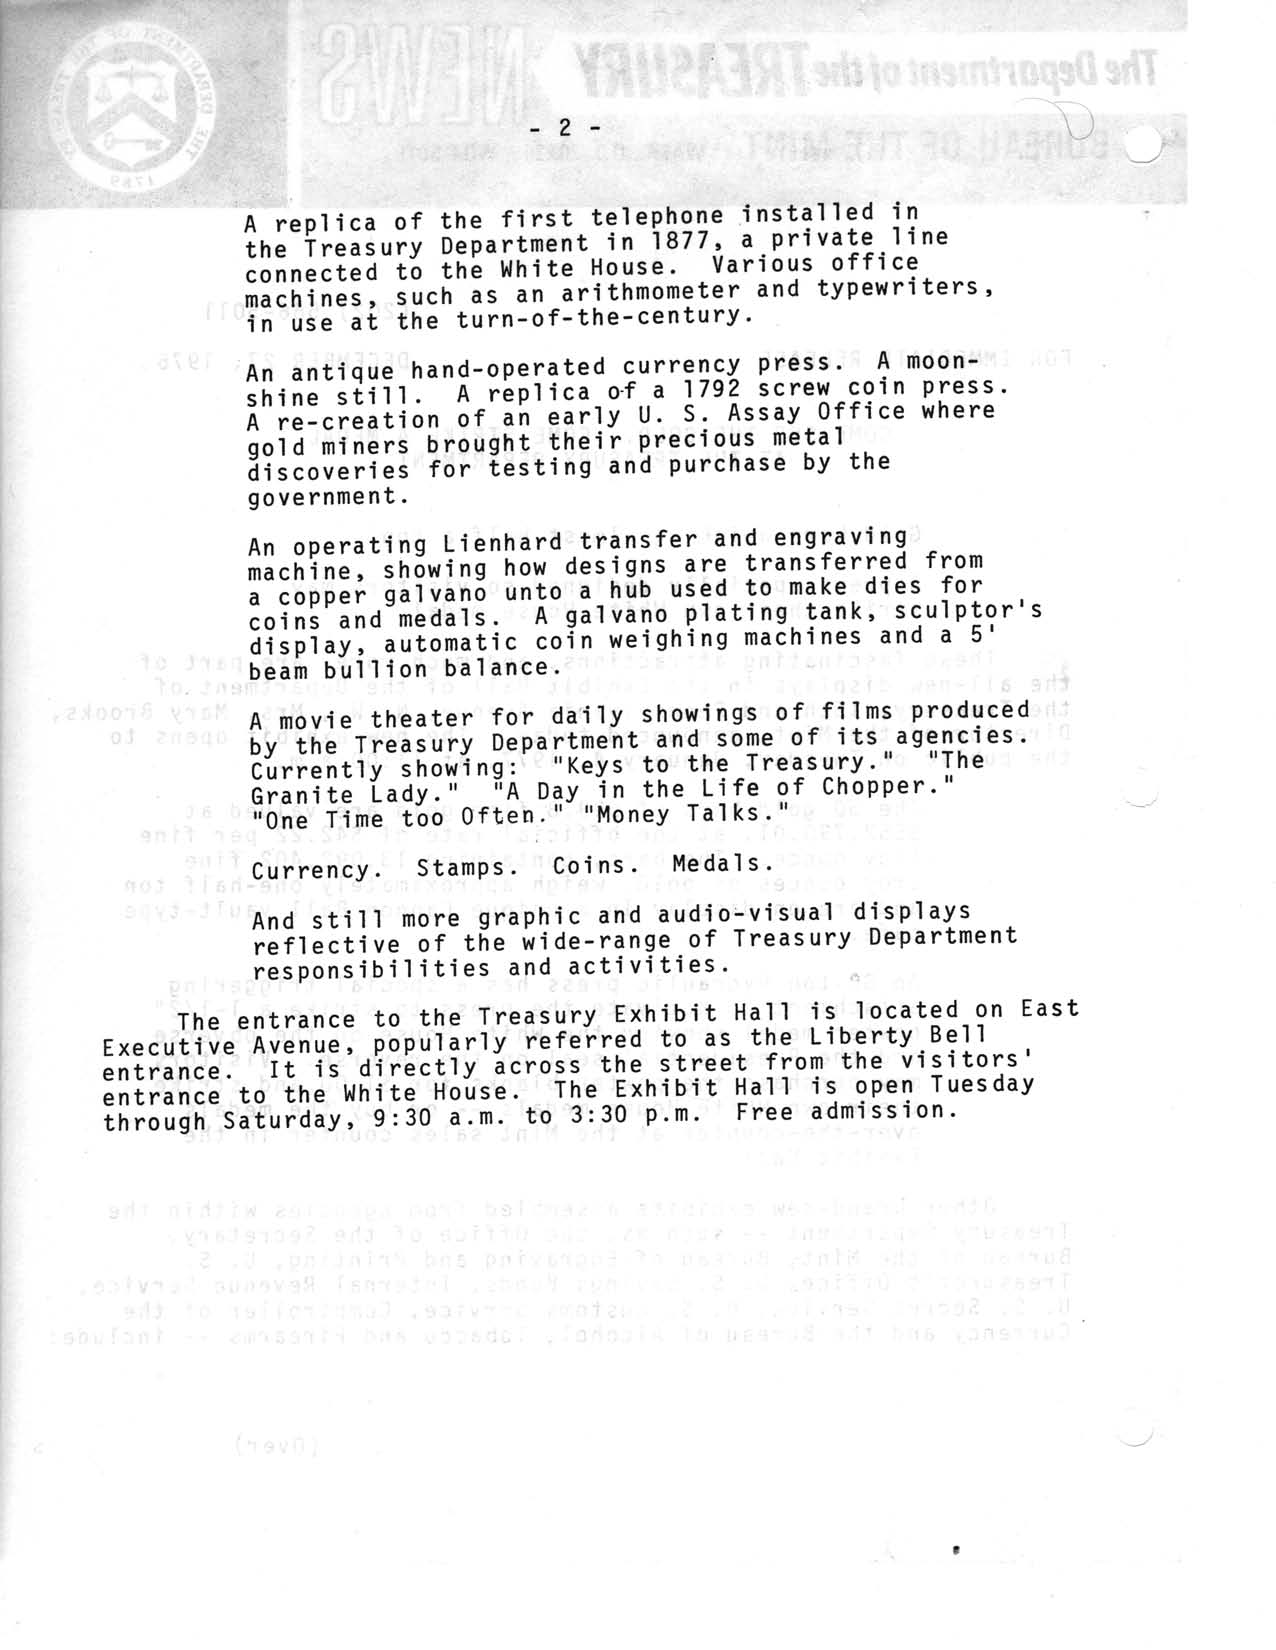 Historic Press Release: New Treasury Exhibit Displays, Page 2